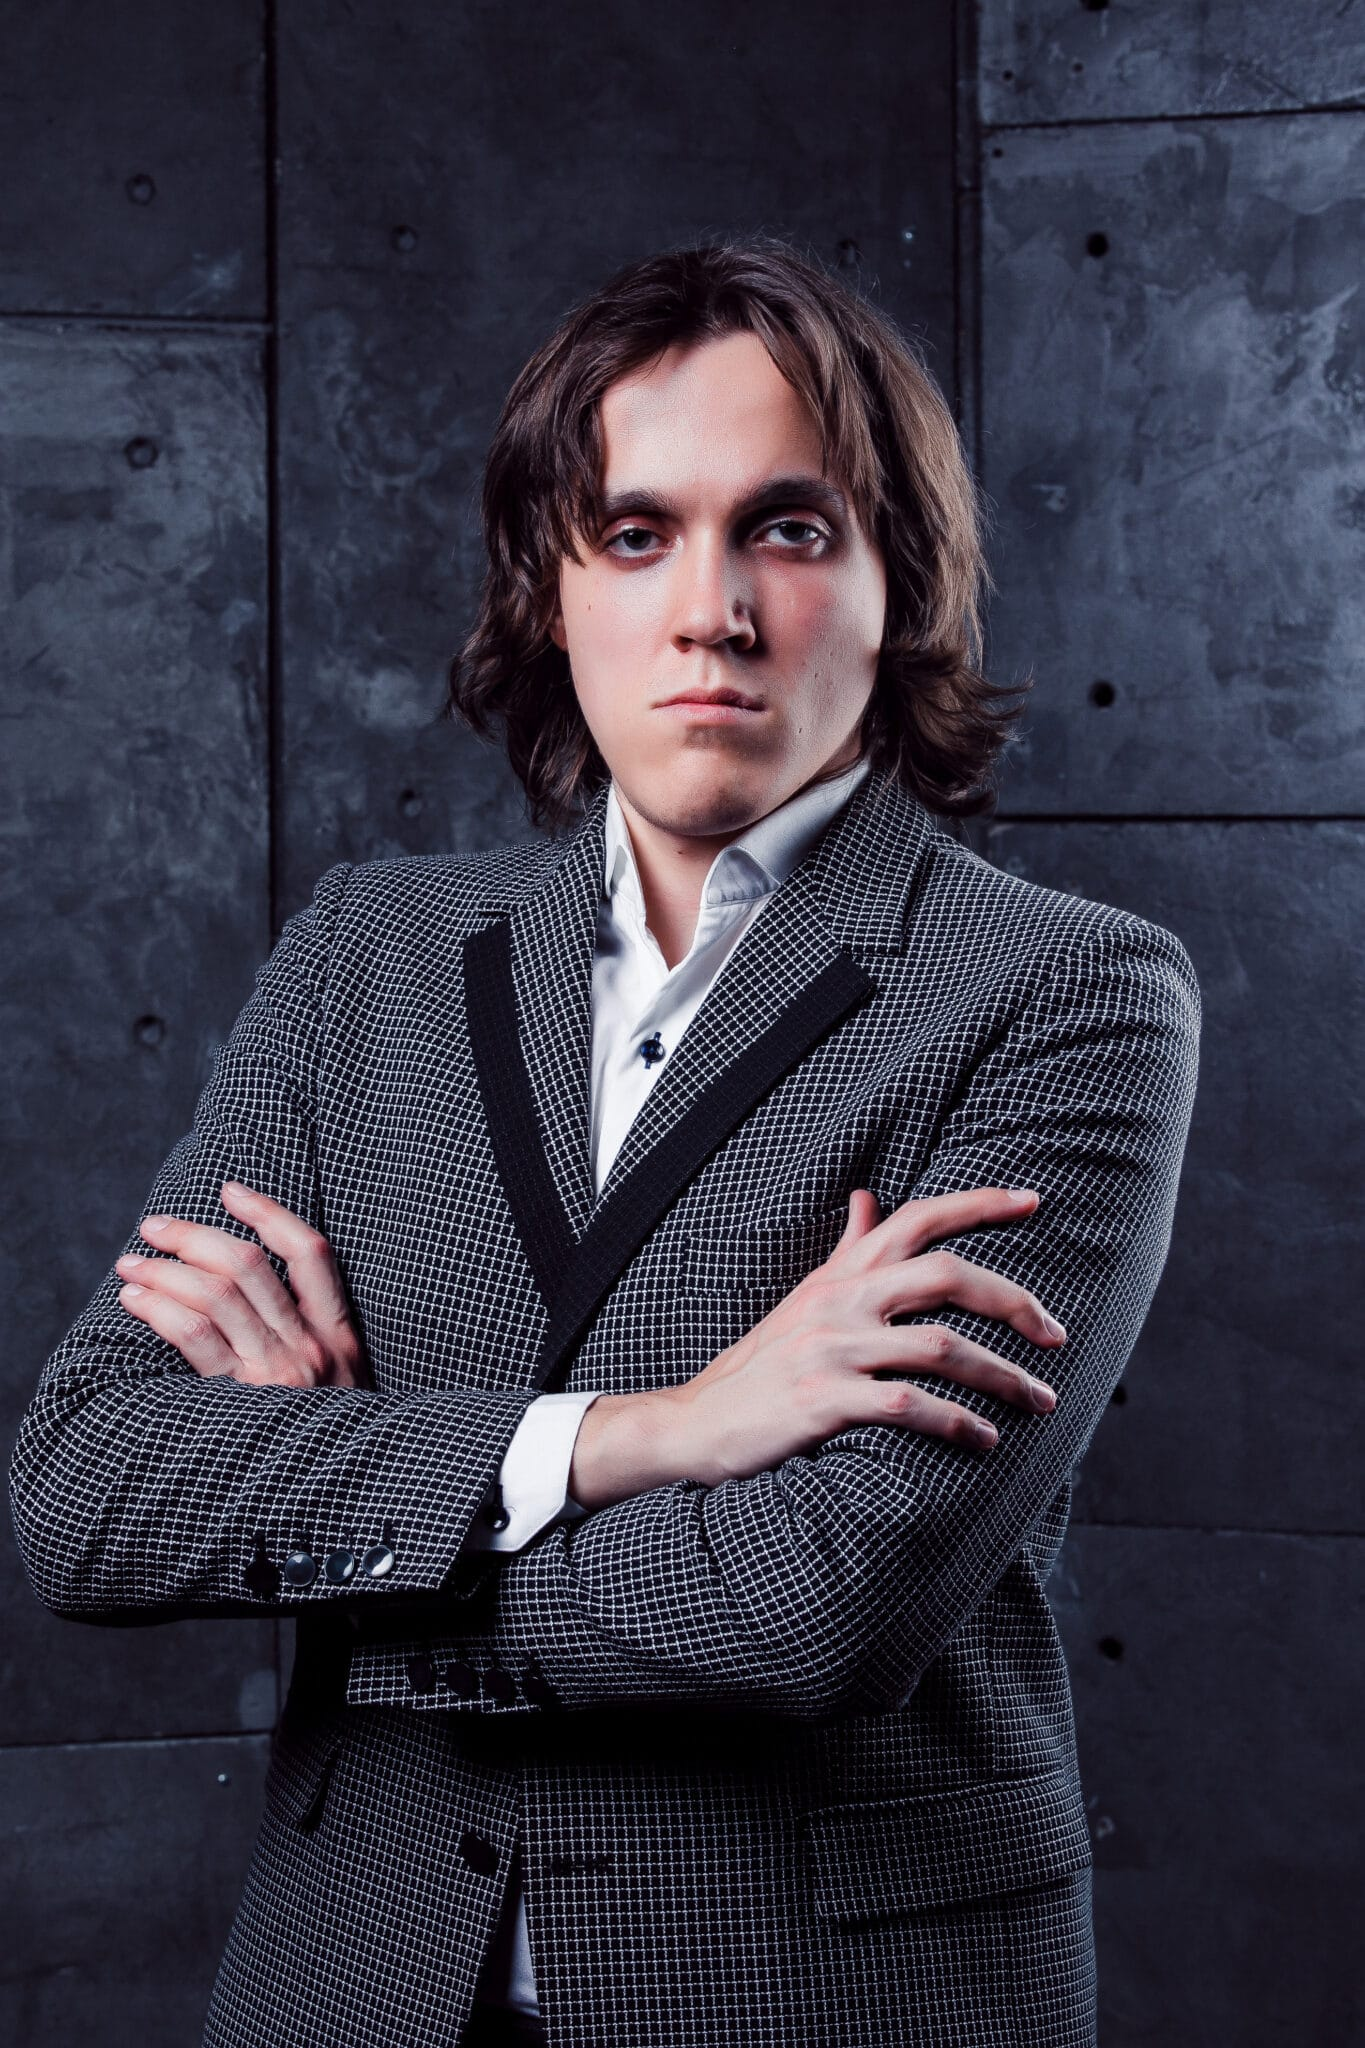 Alex Borisov ROCKETECH